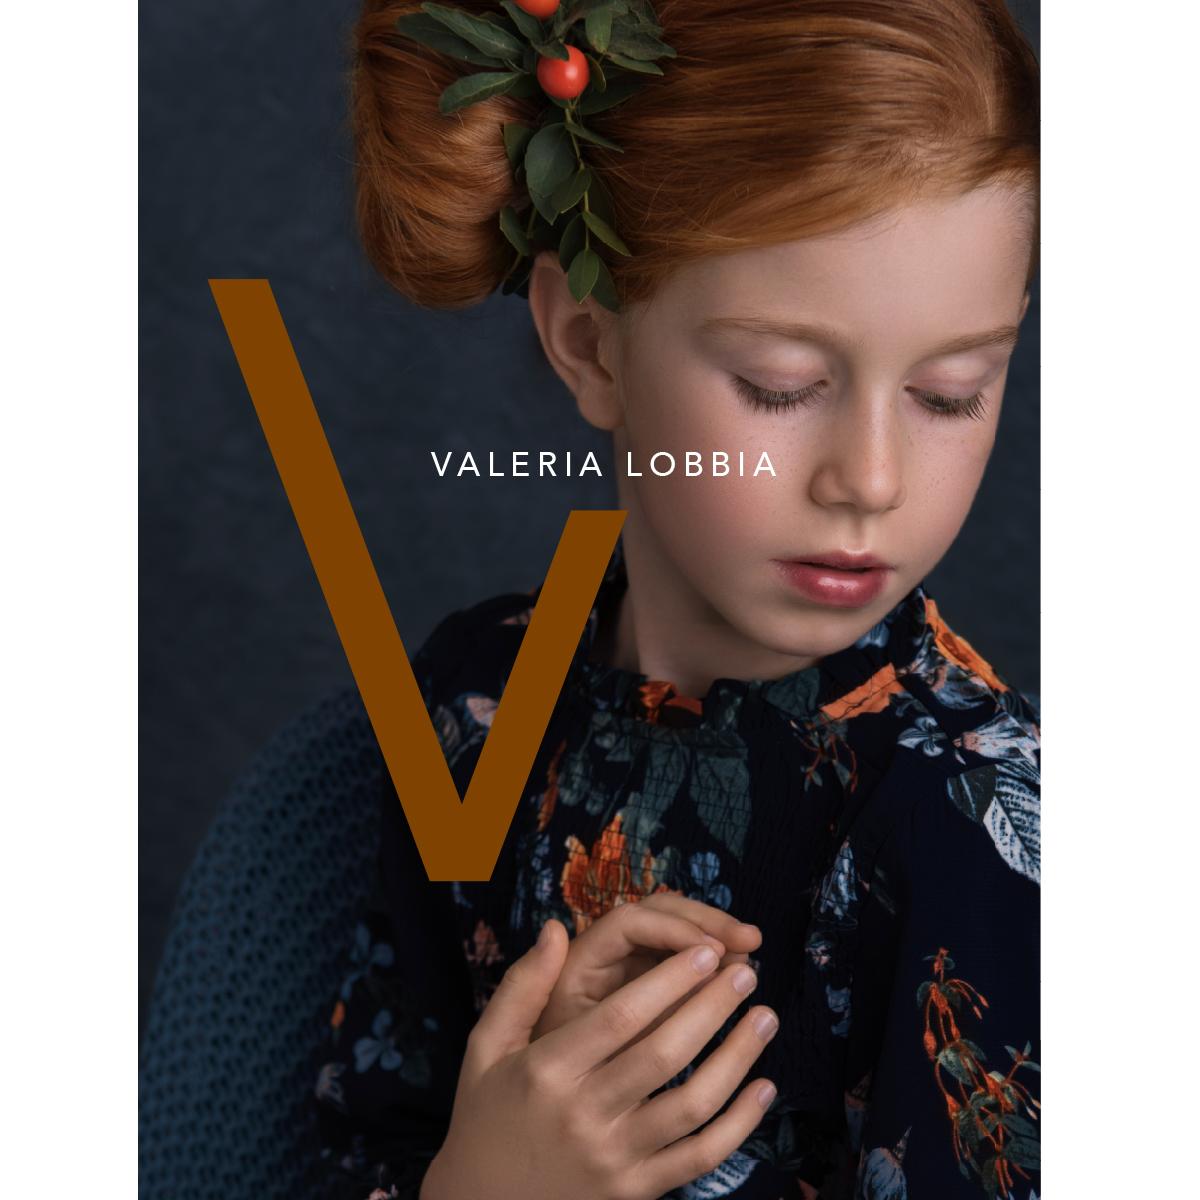 Brand Identity for Valeria Lobbia Italian Photographer by Your Playbook